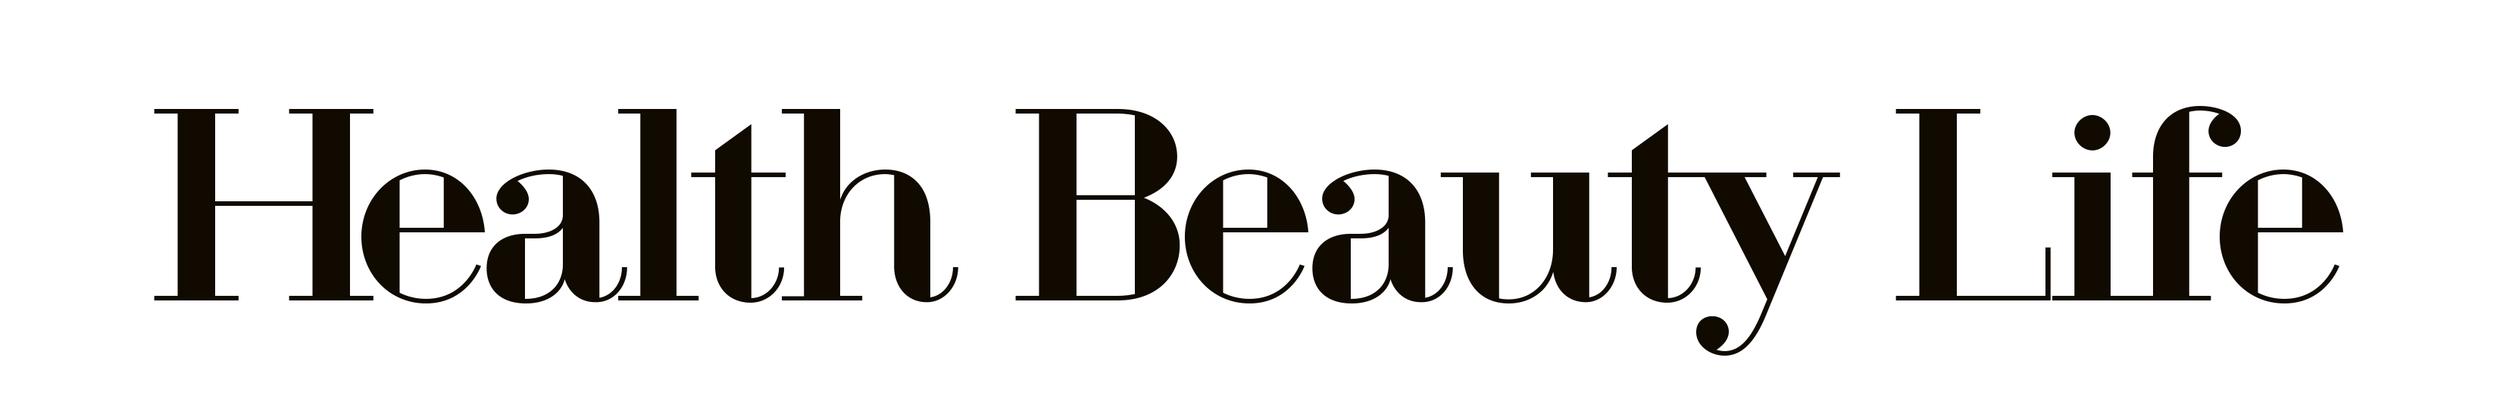 HEALTH_BEAUTY_LIFE_BLK.jpg